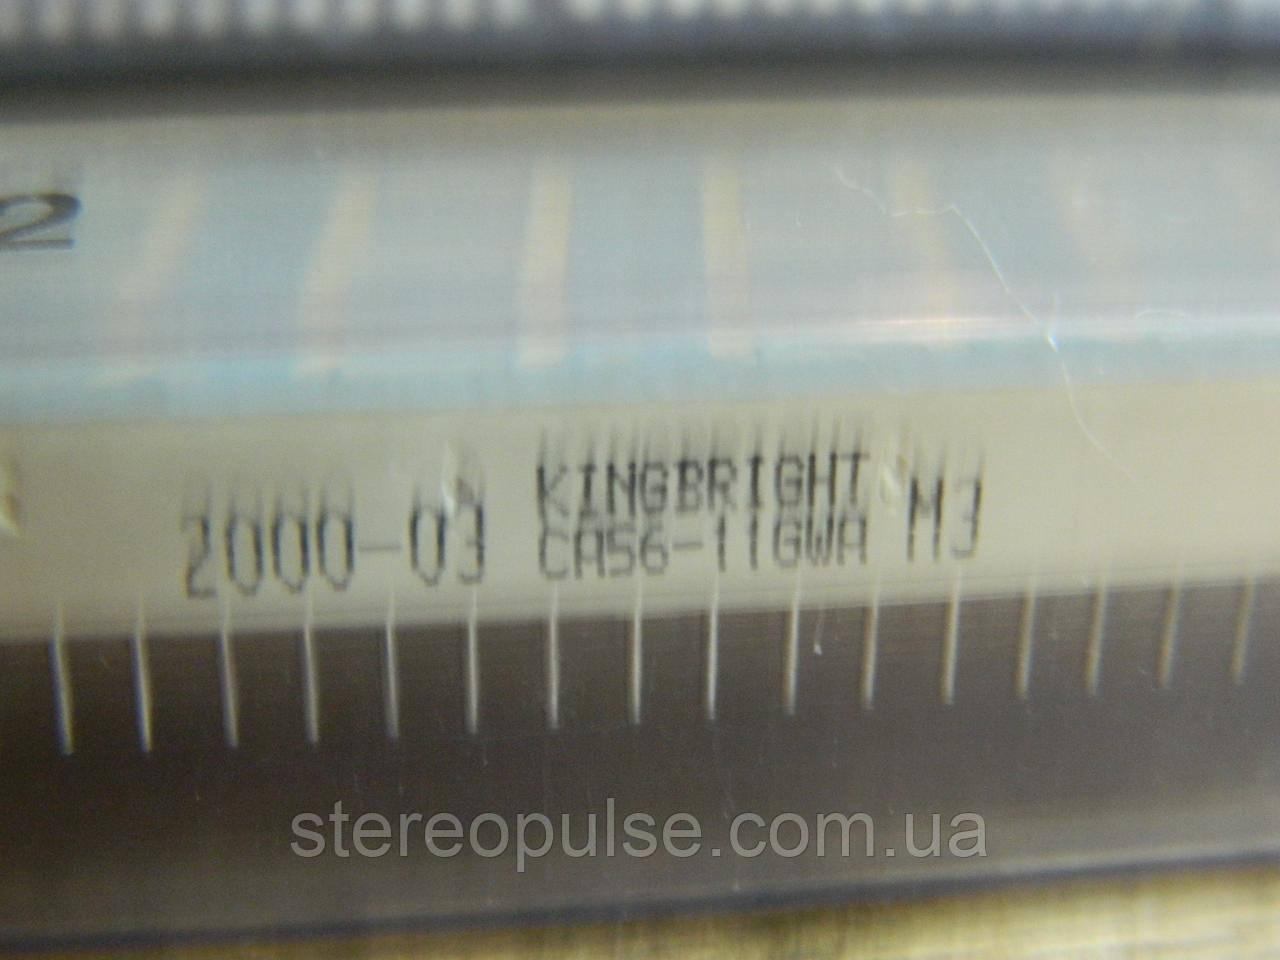 Индикатор  CA56 - 11GWA   KINGBRIGHT  зеленый .